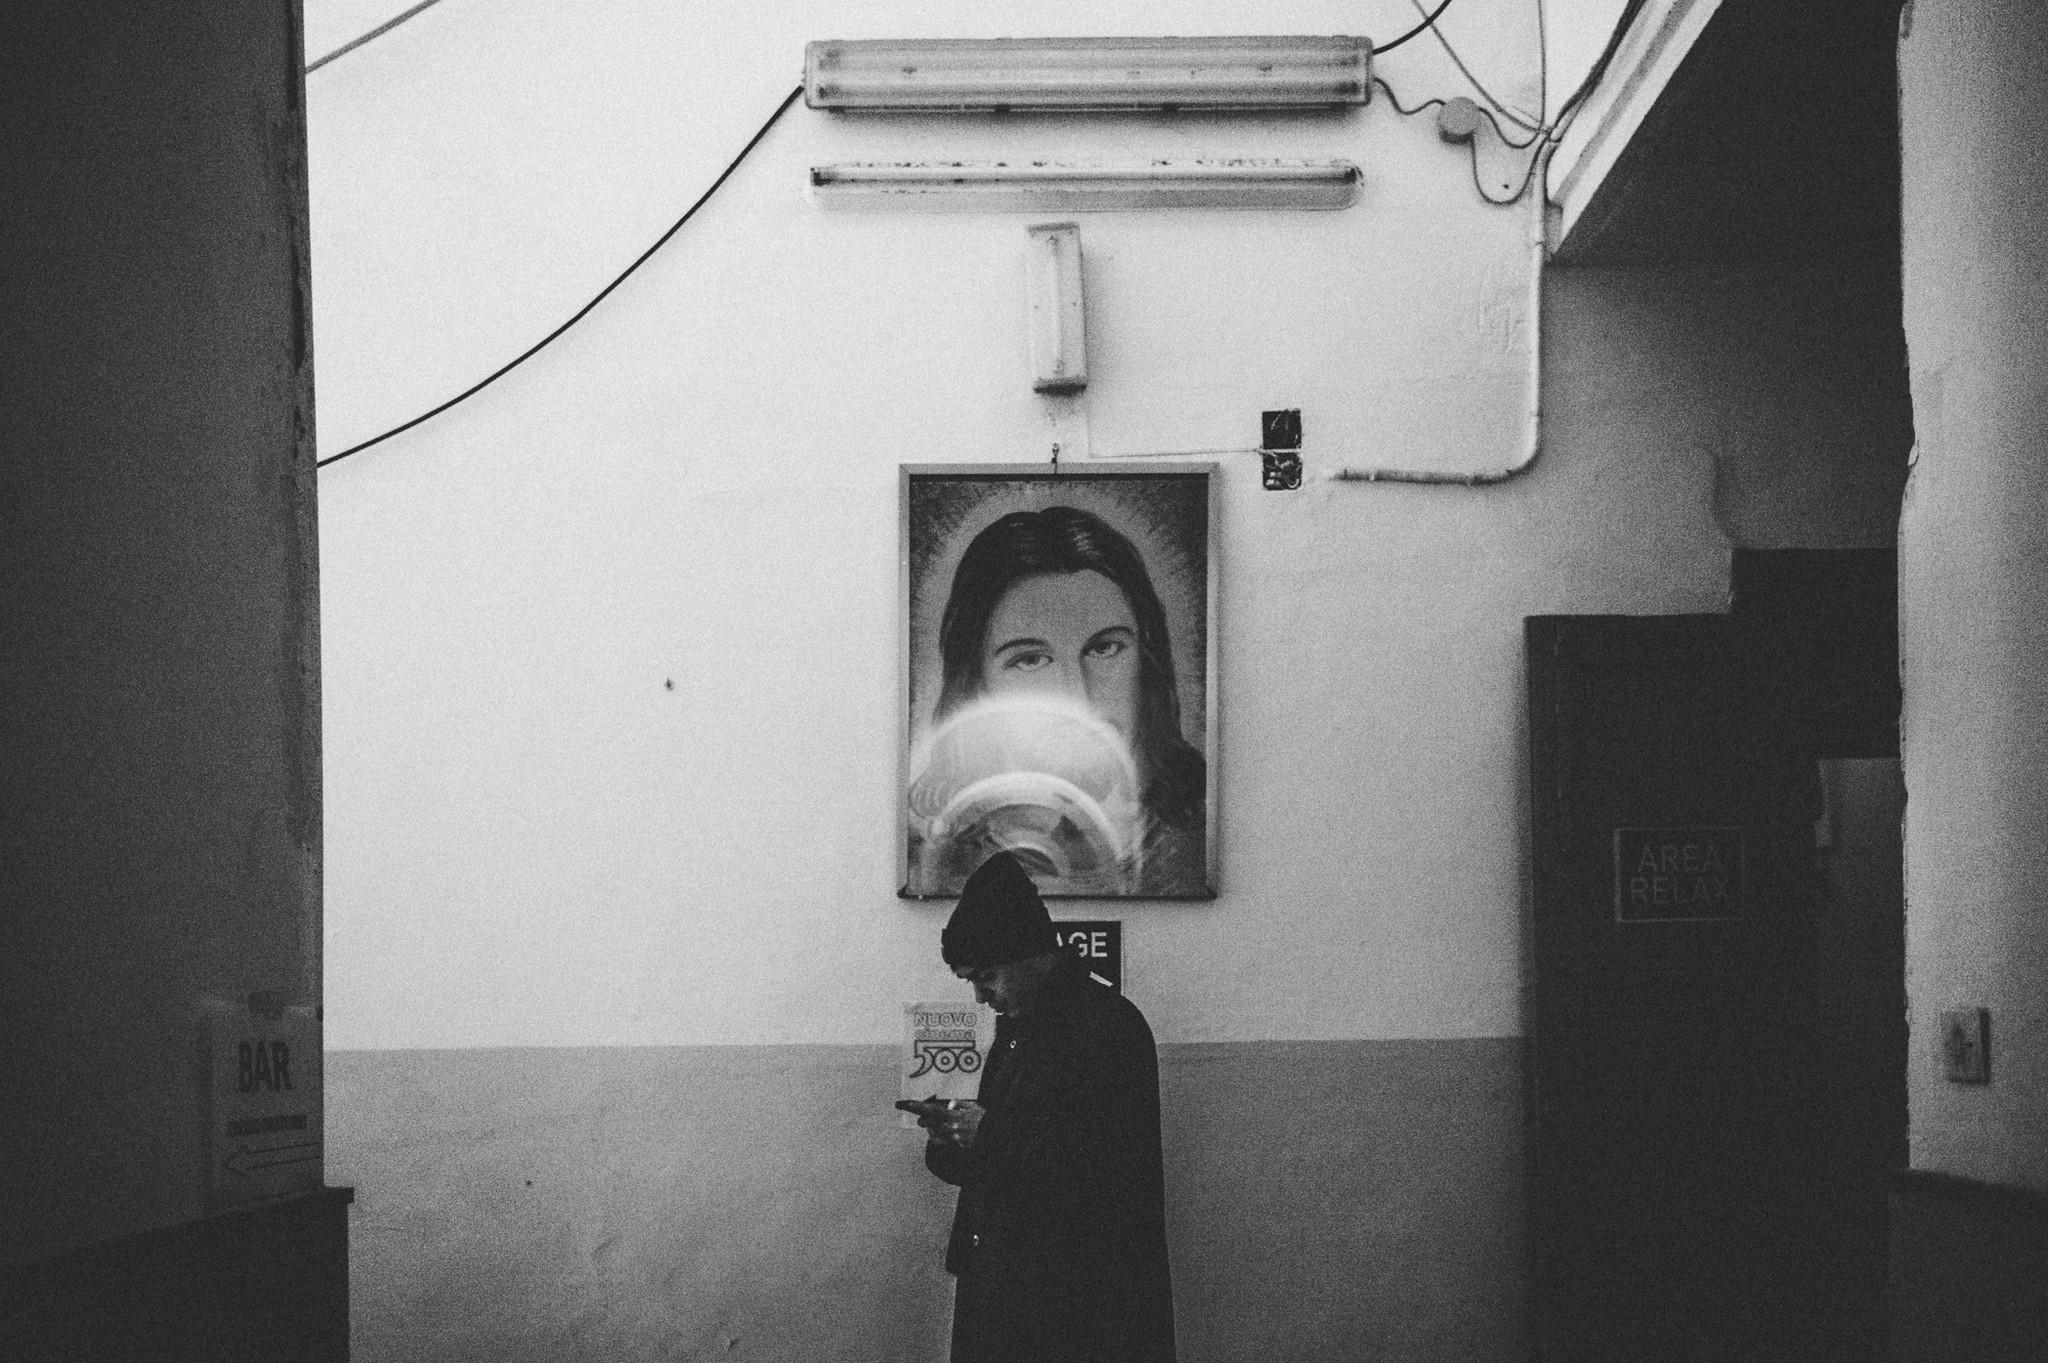 Flavia_Fiengo_esperimenti_2017_54